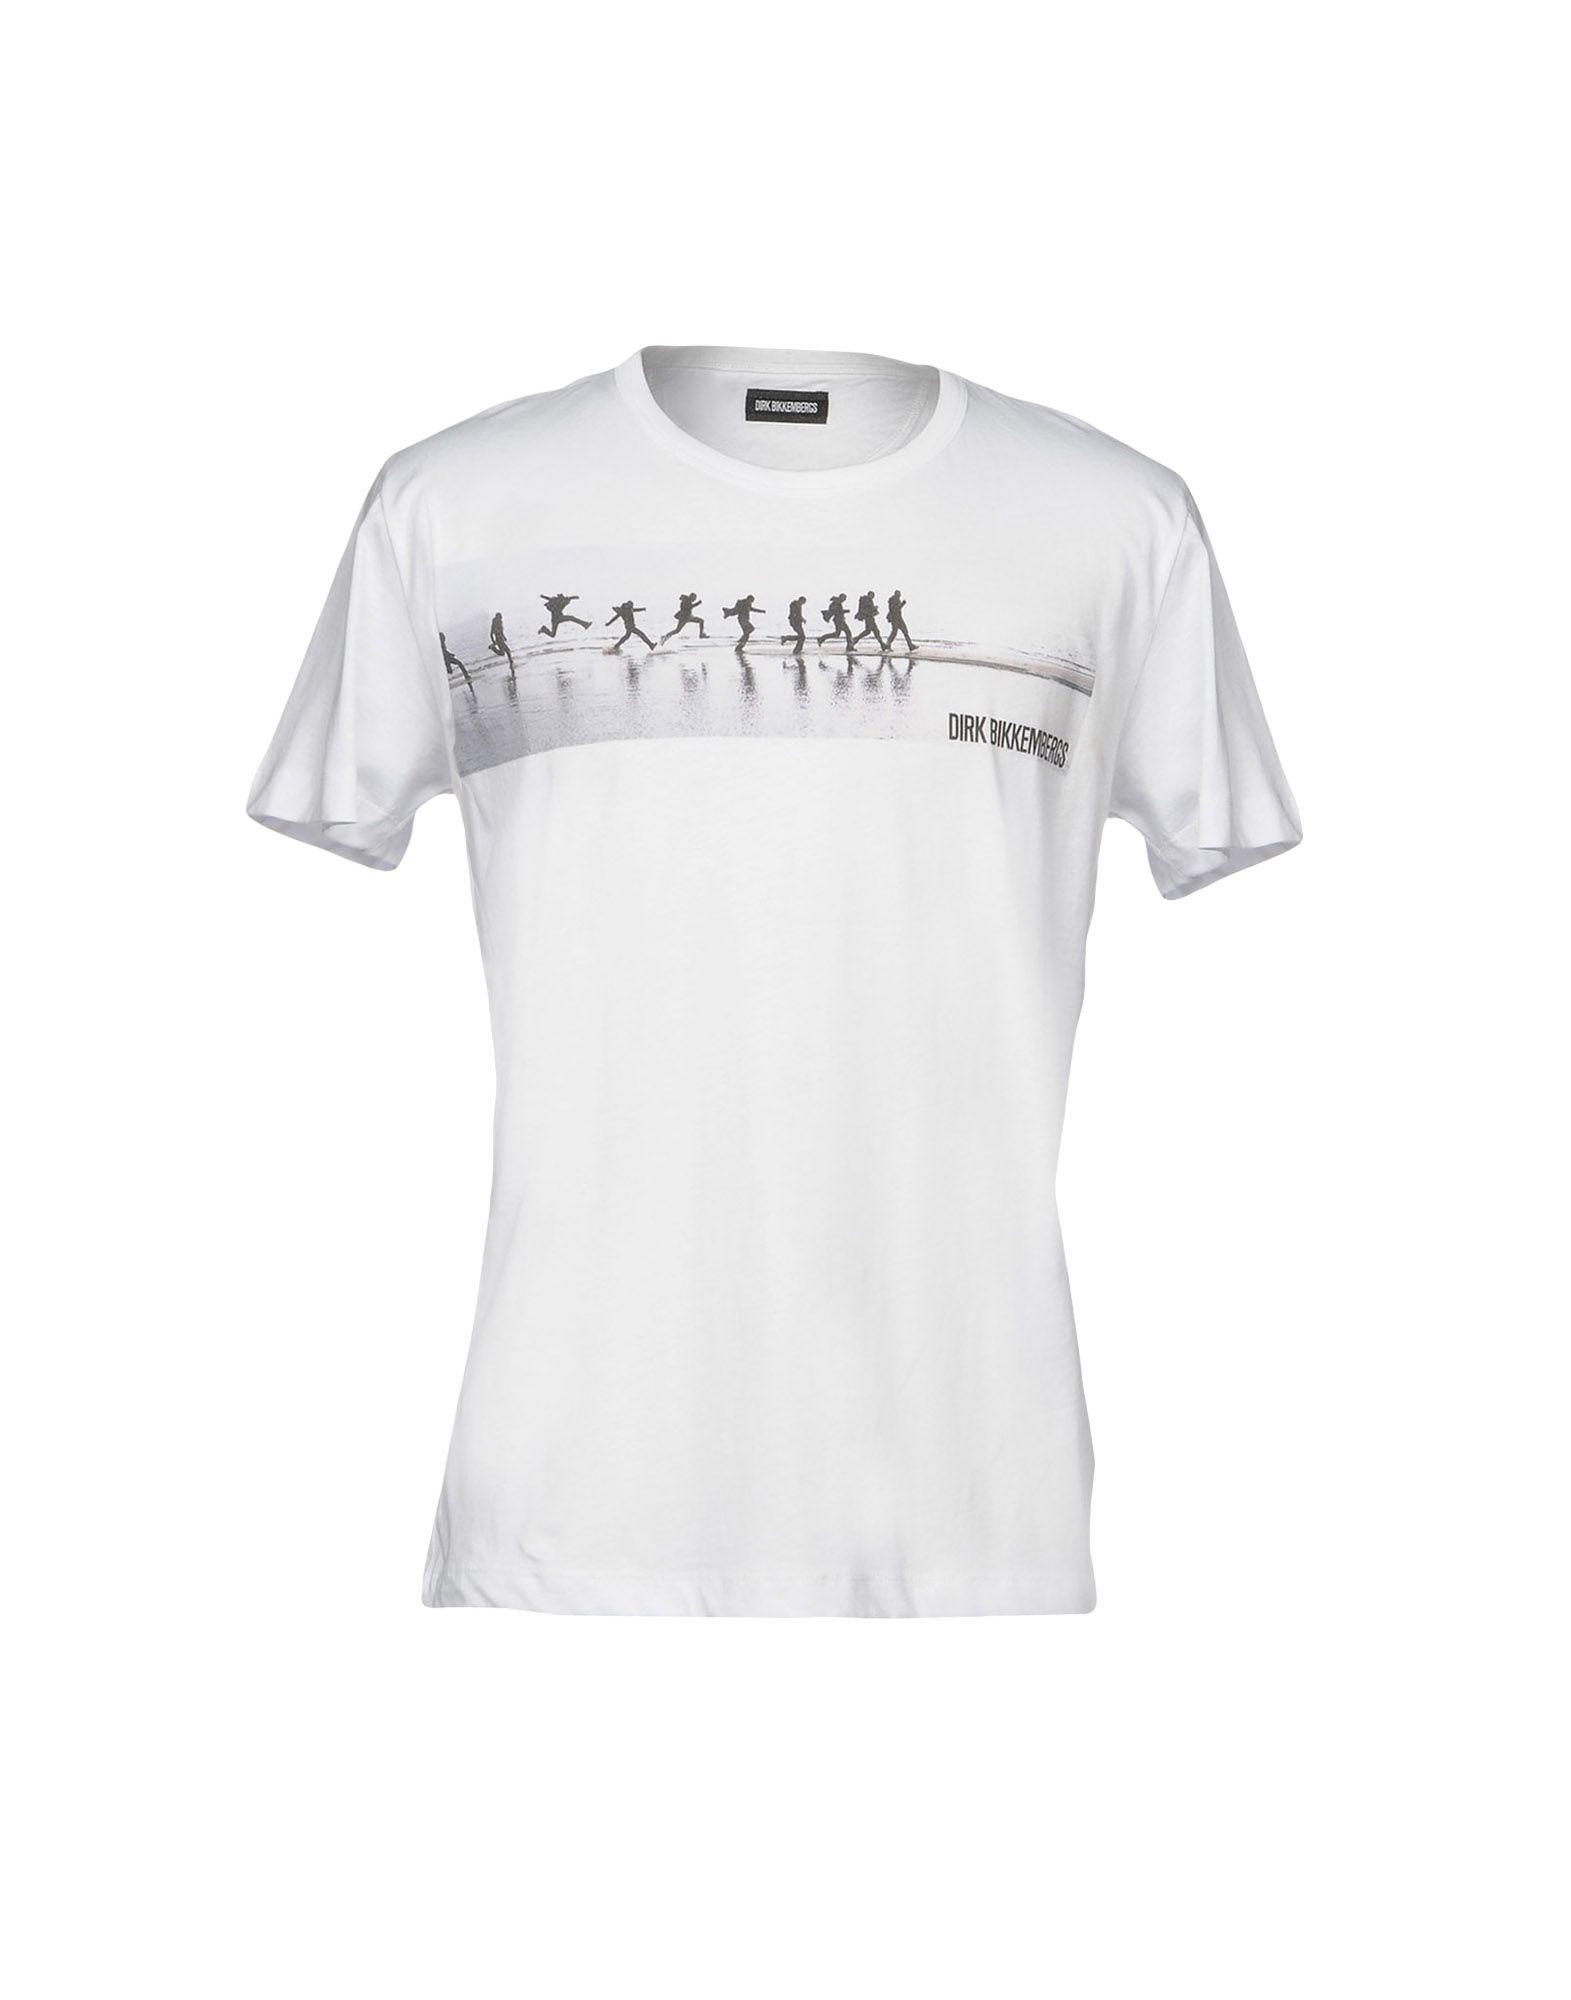 DIRK BIKKEMBERGS Футболка футболка dirk bikkembergs футболка